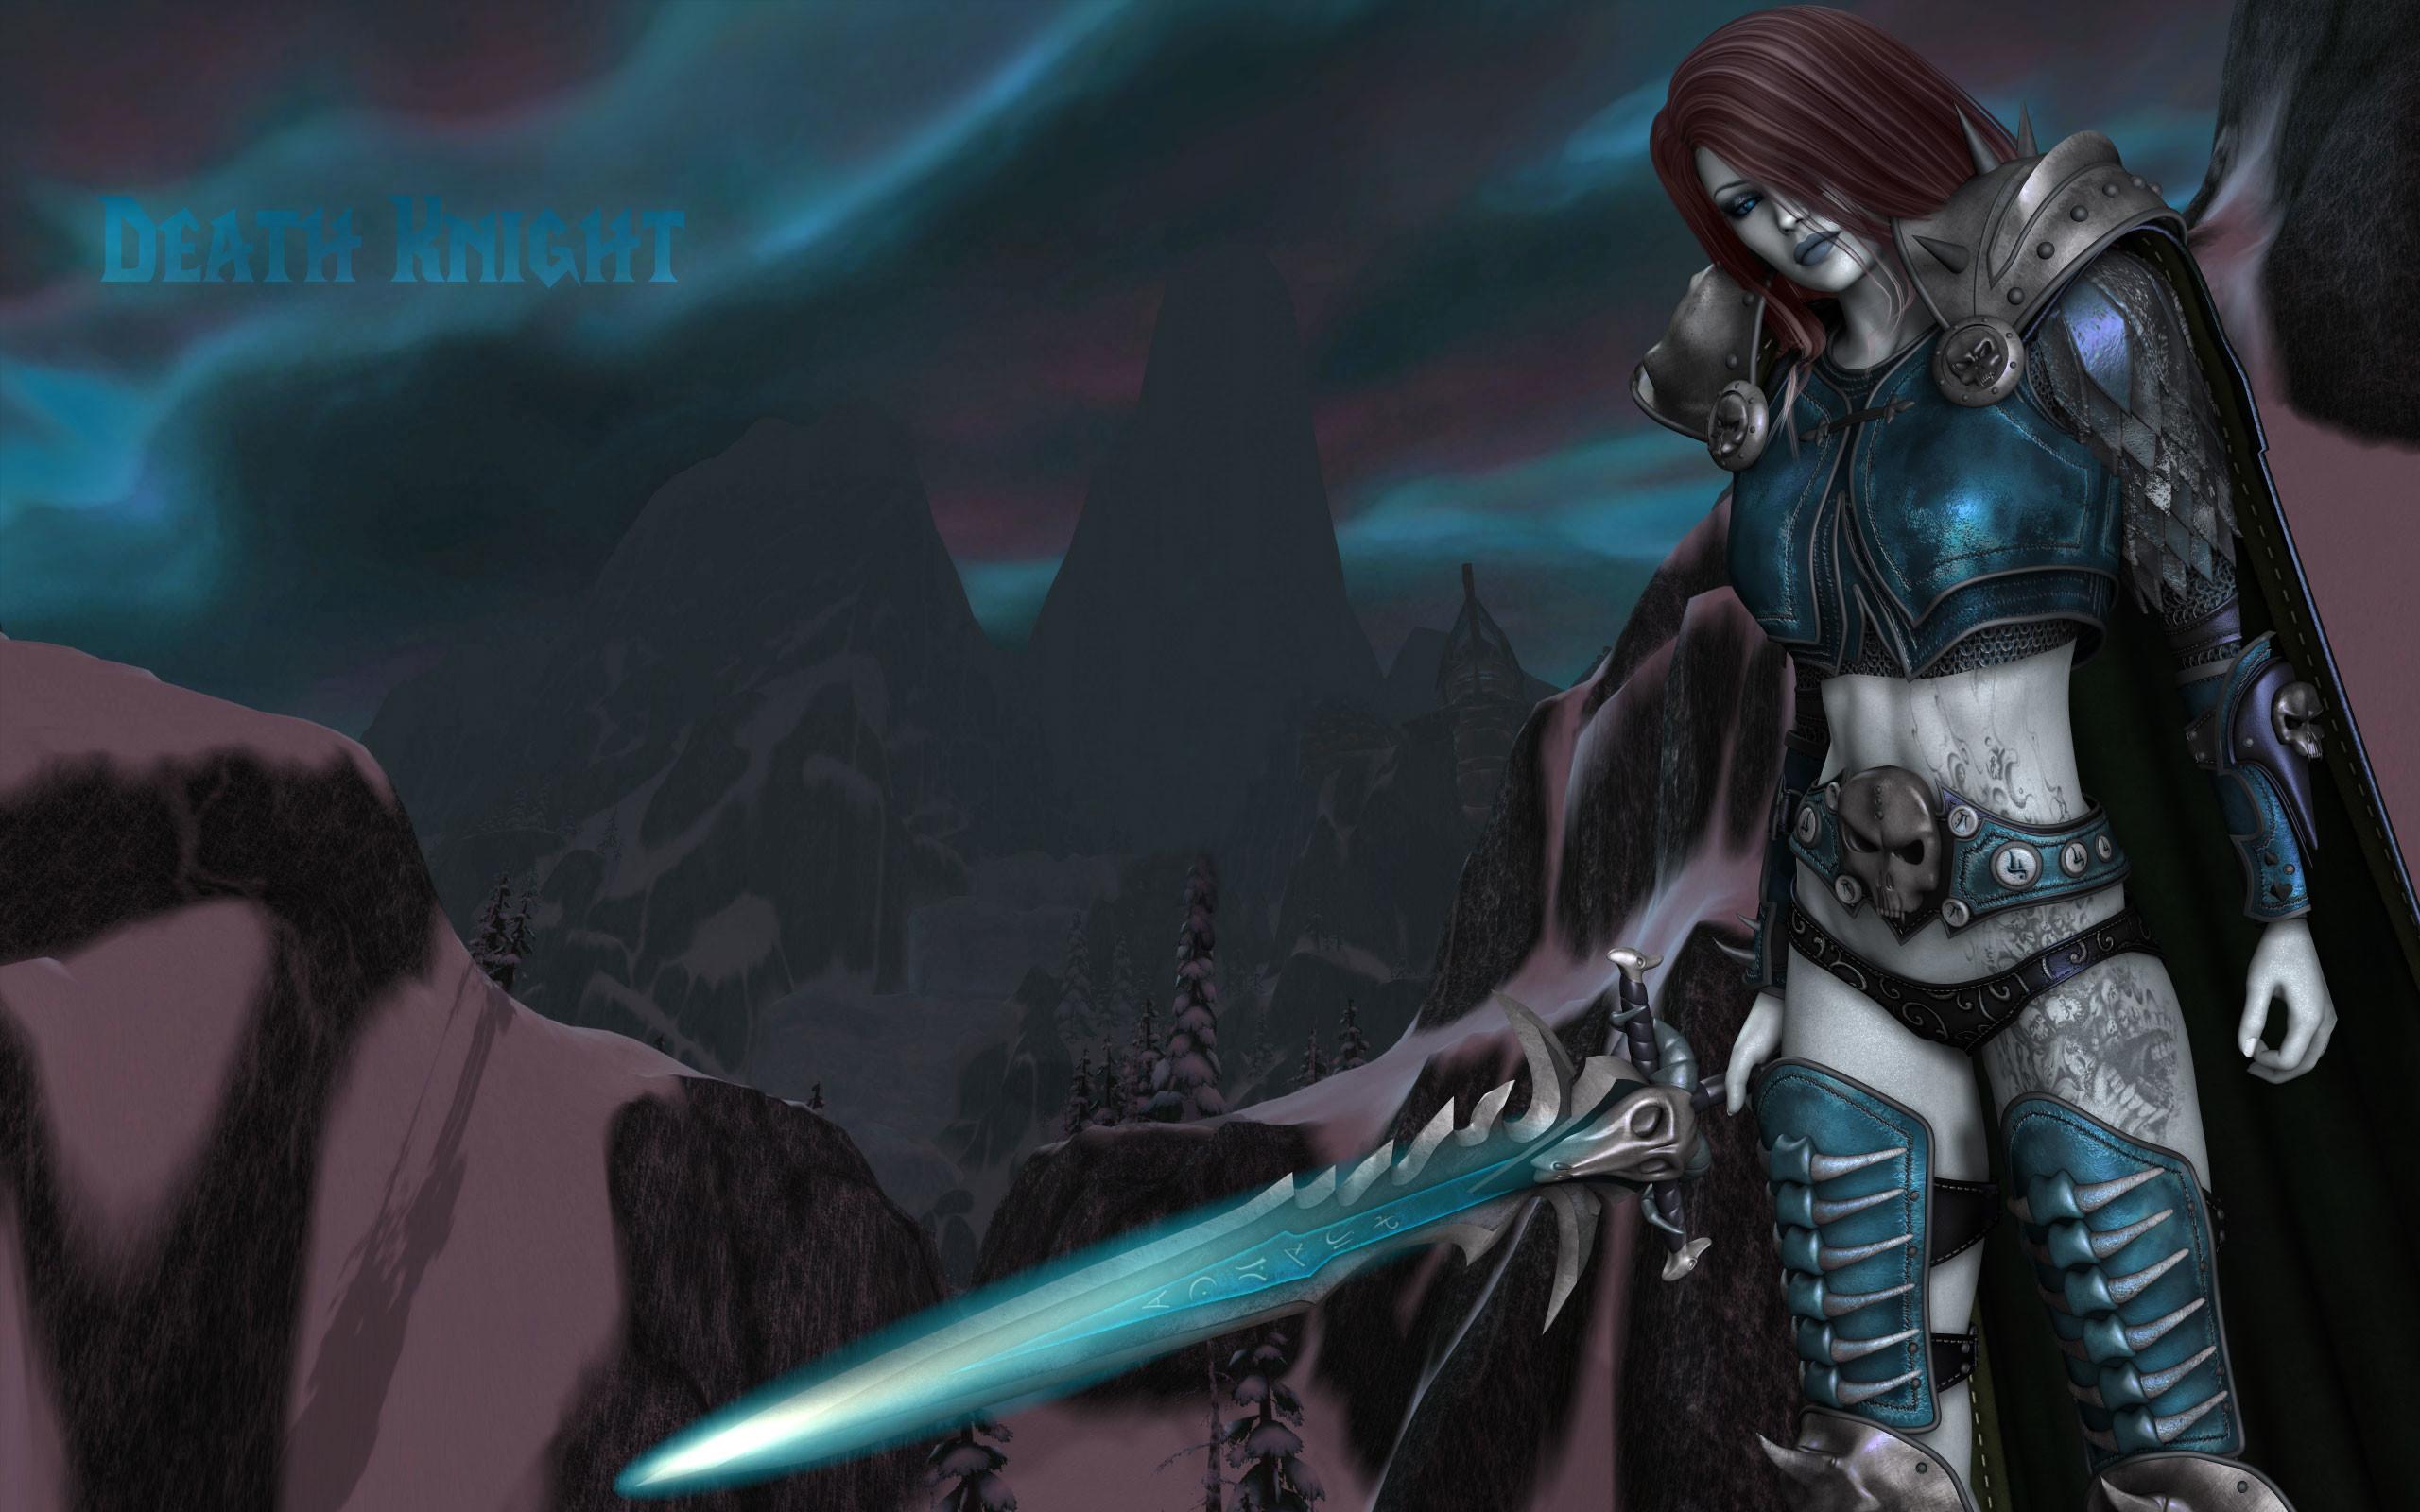 Free world of warcraft wallpaper background